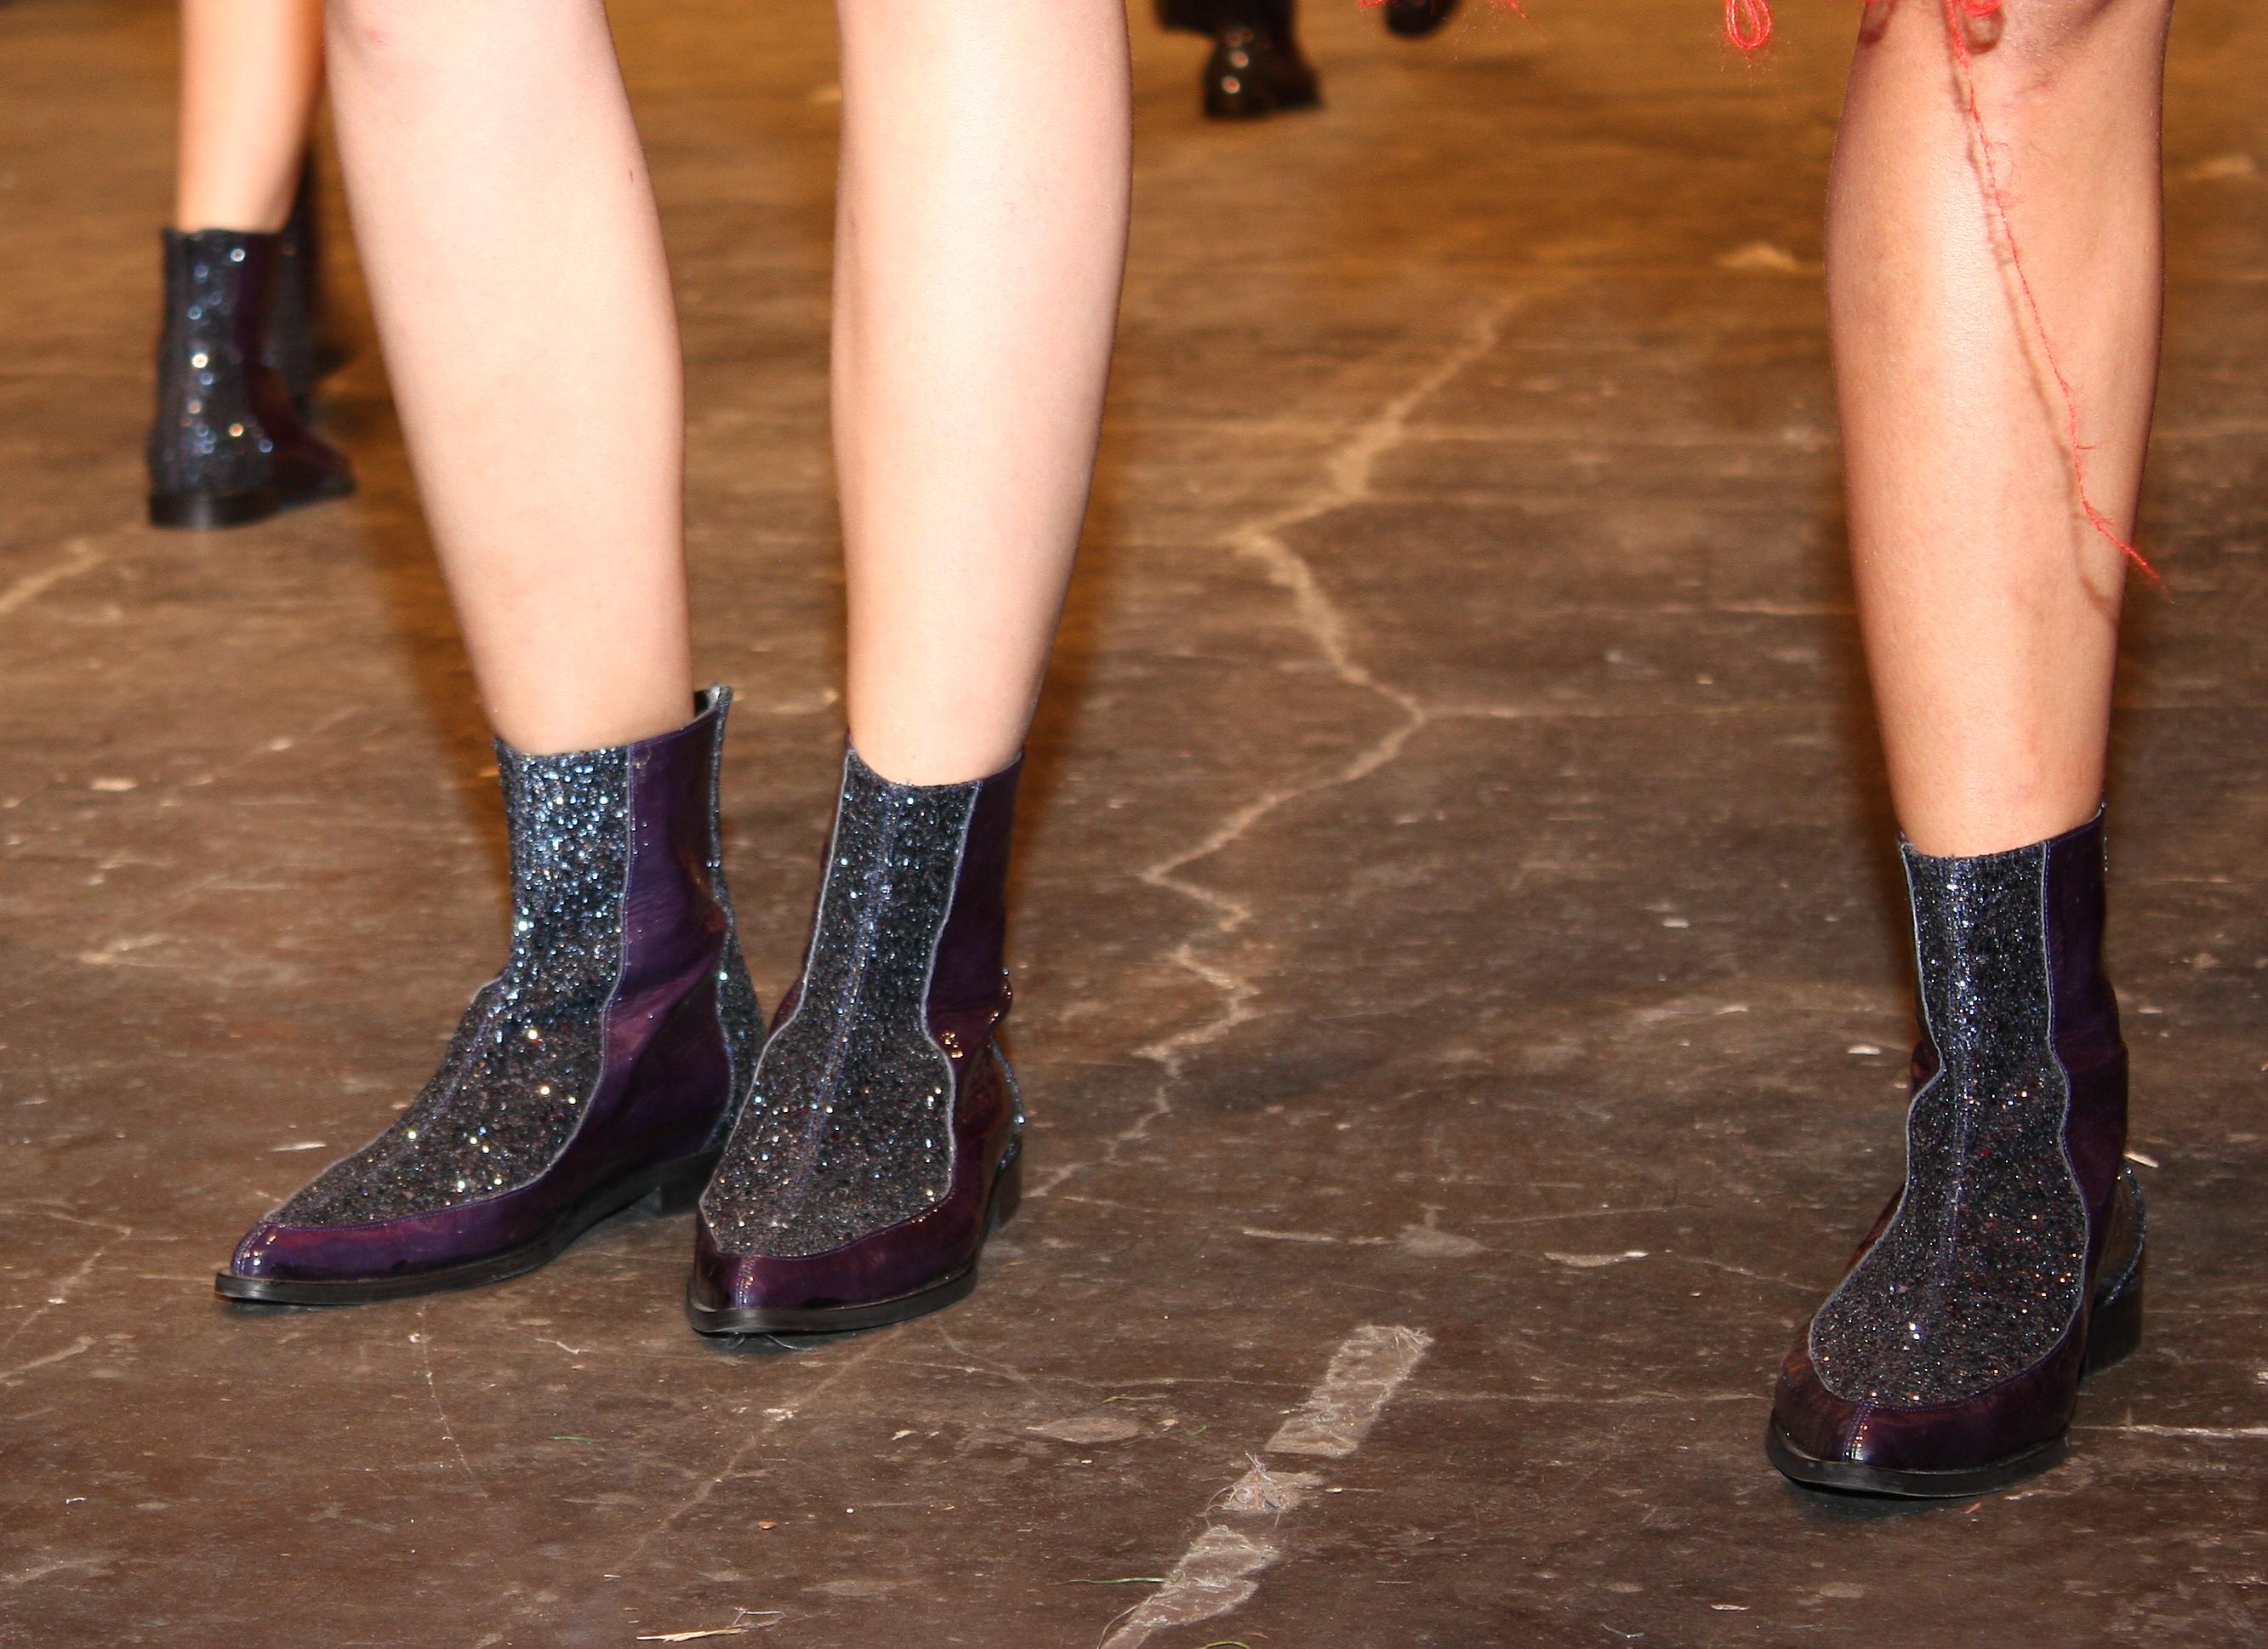 Kiane Frankfurt Shenkar Uncoded Steps בלוג נעליים אופנה שנקר